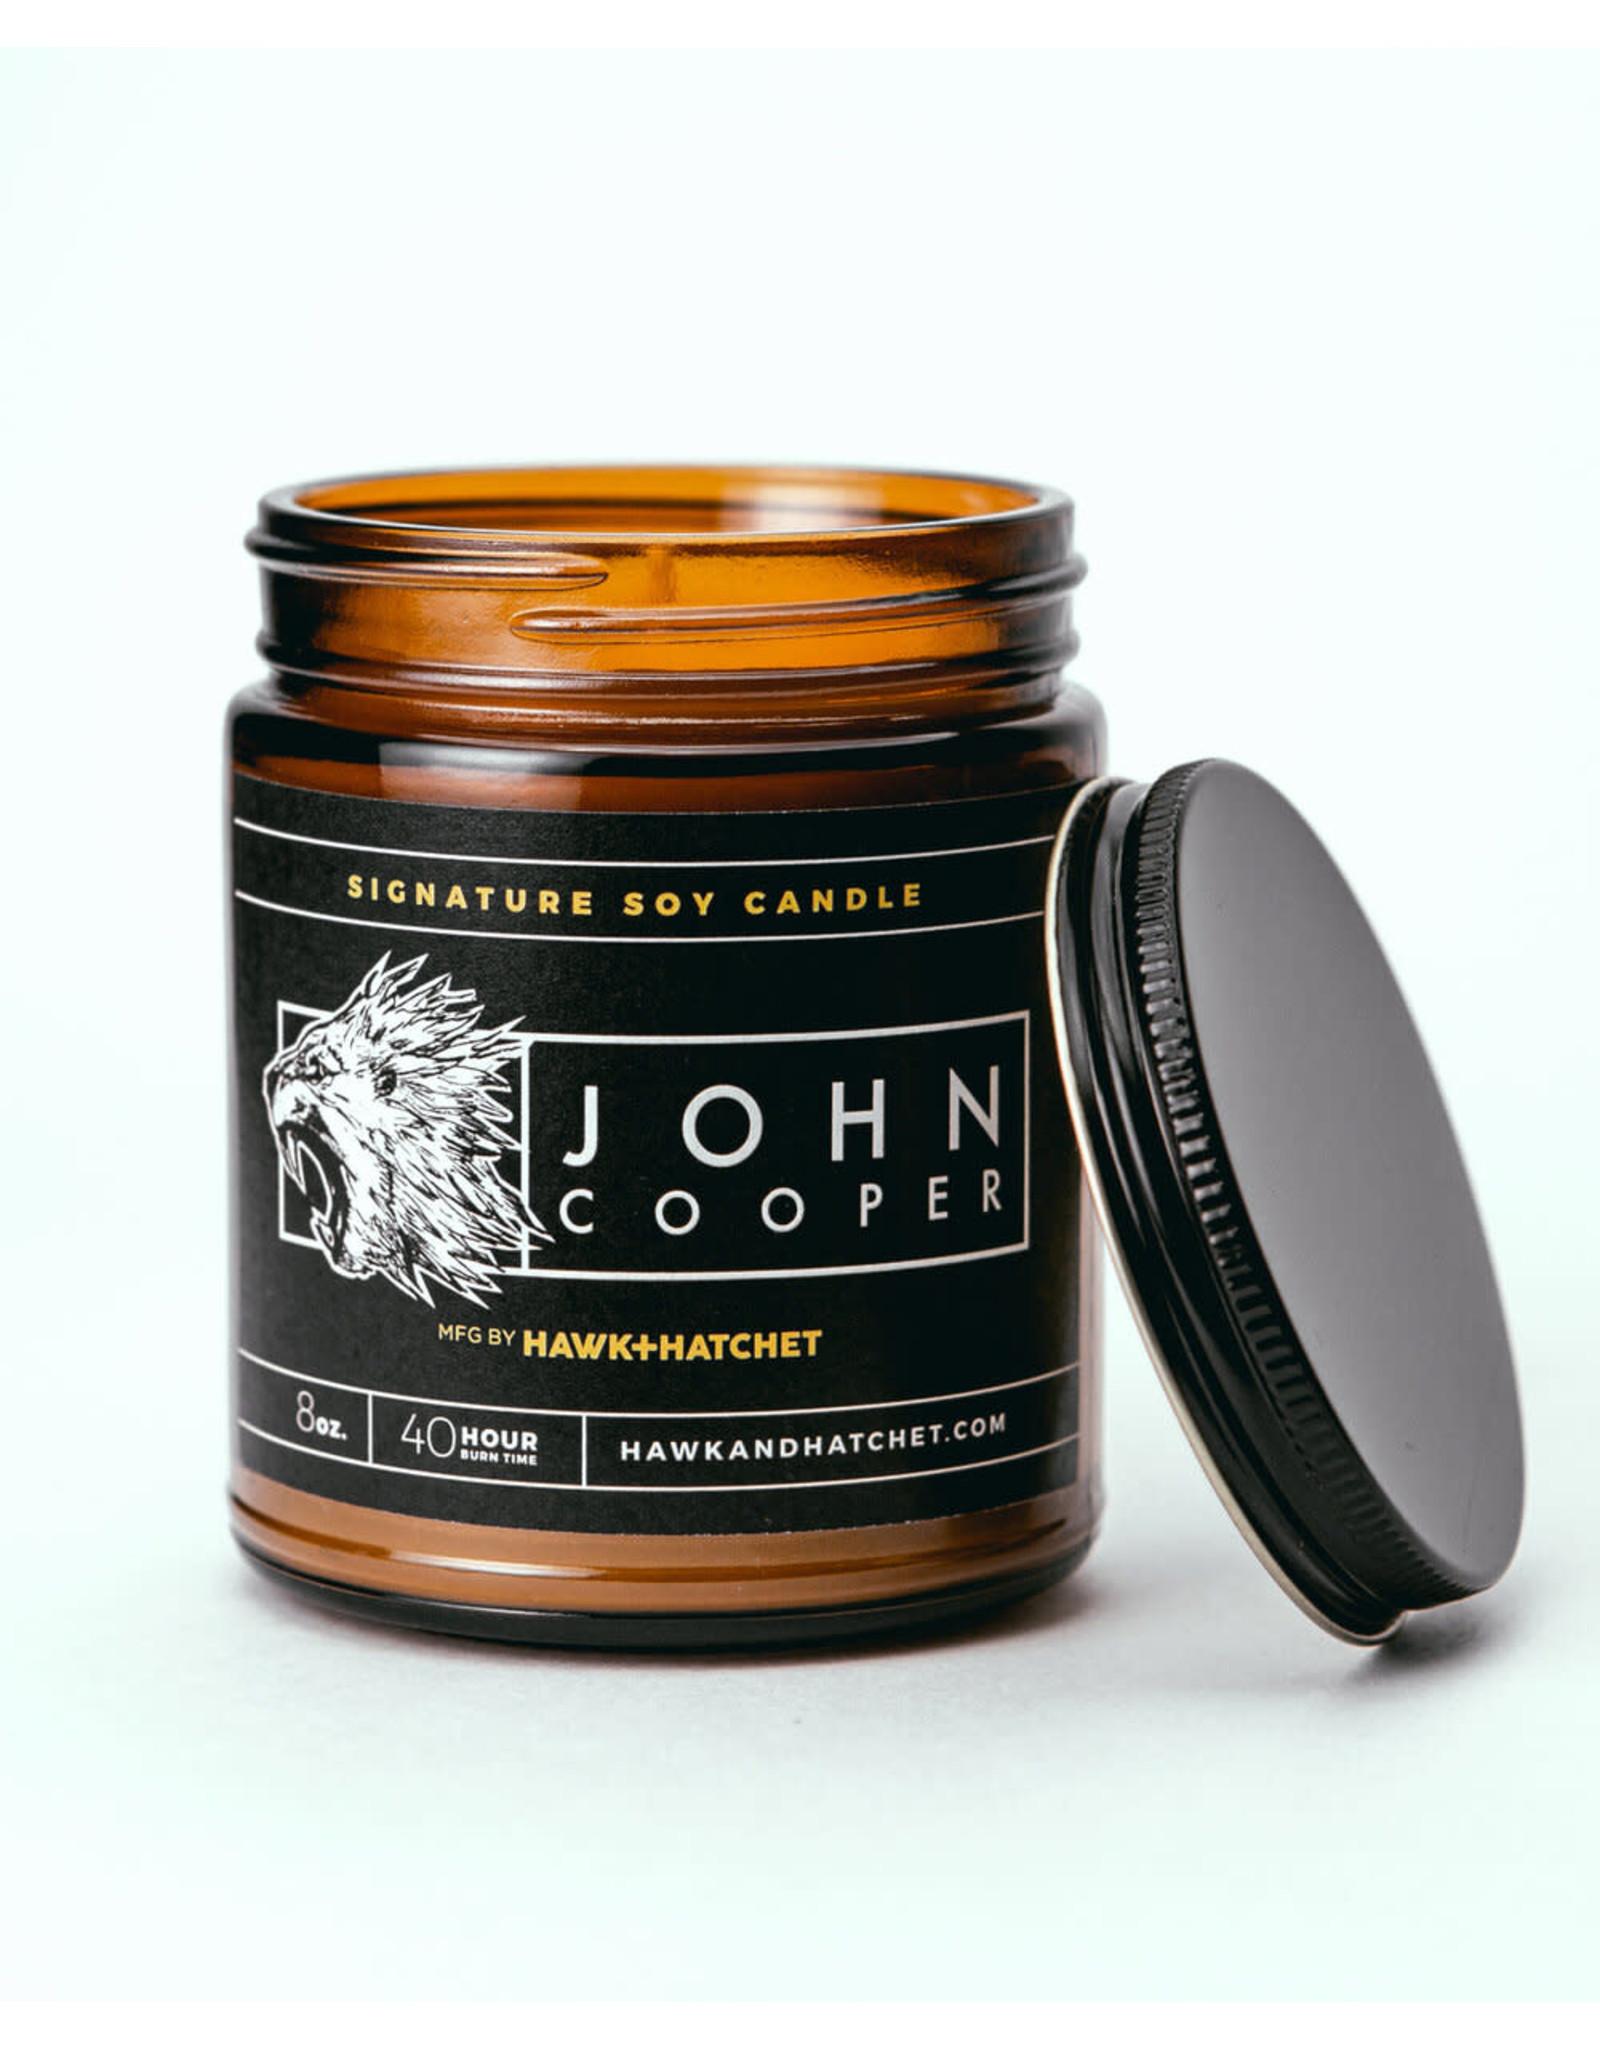 Hawk & Hatchet John Cooper Candle - 8 oz